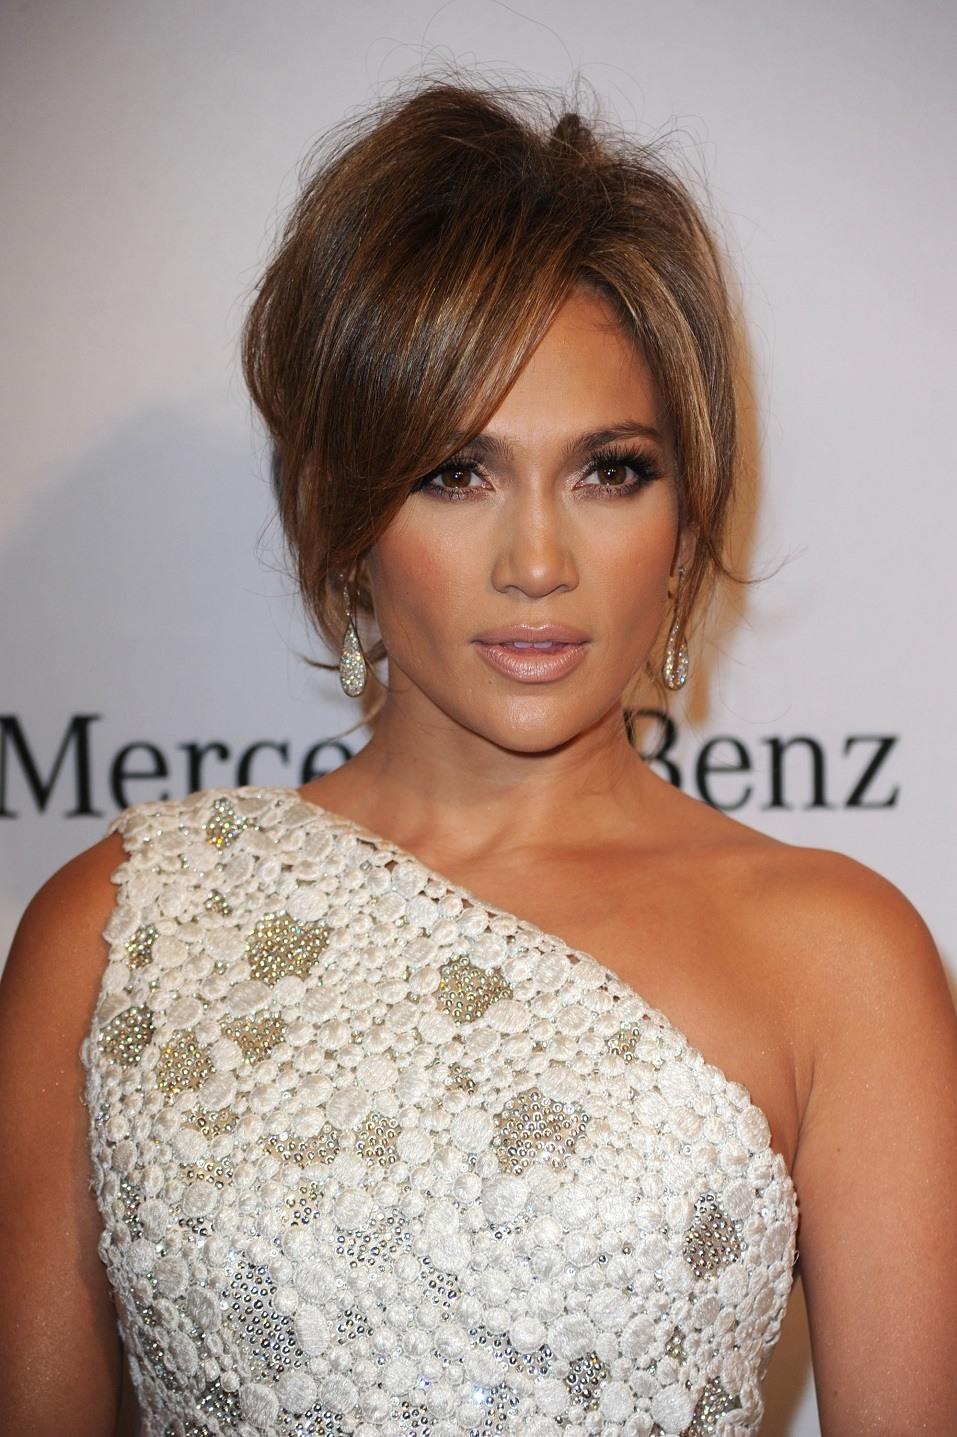 Singer Jennifer Lopez arrives at the 32nd Anniversary Carousel Of Hope Gala